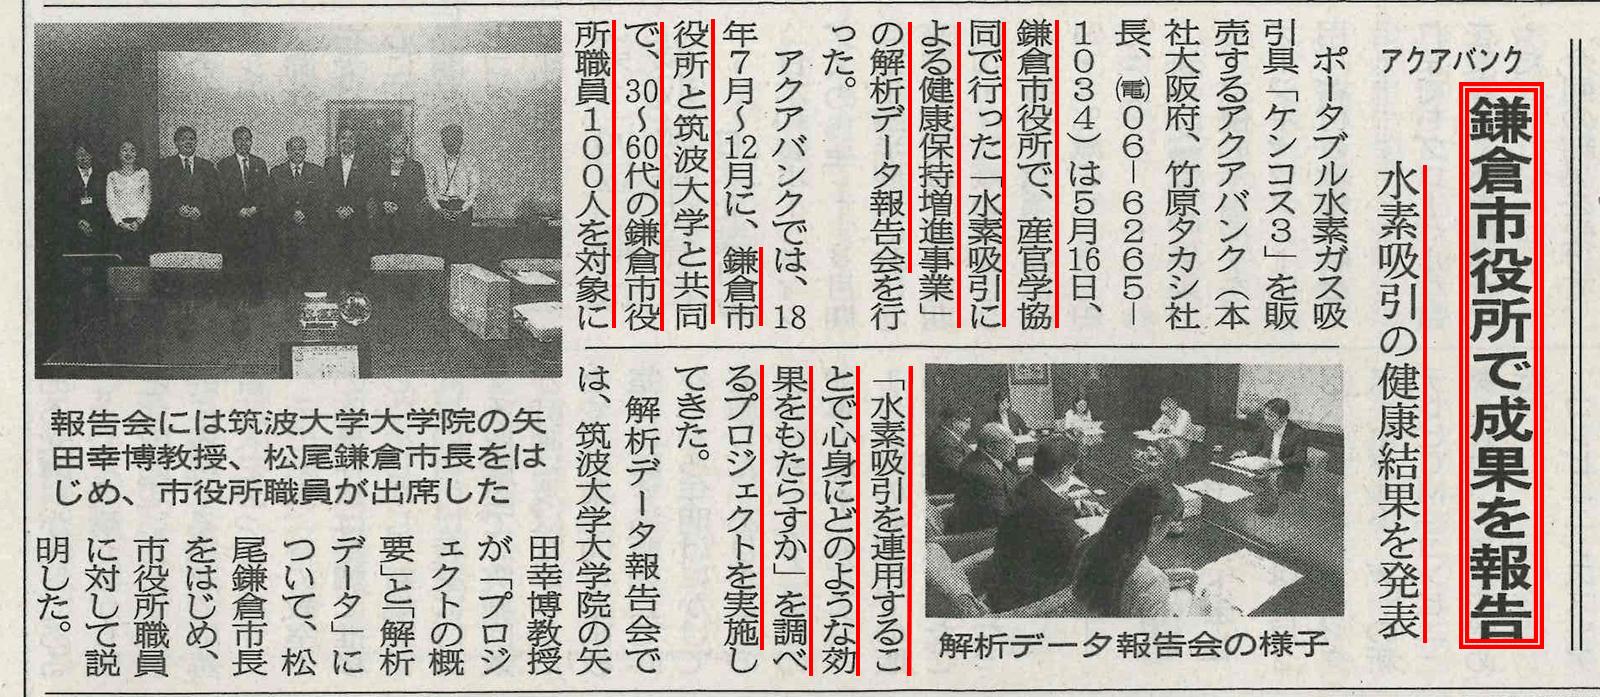 令和元年6月13日号『日本流通産業新聞』より抜粋